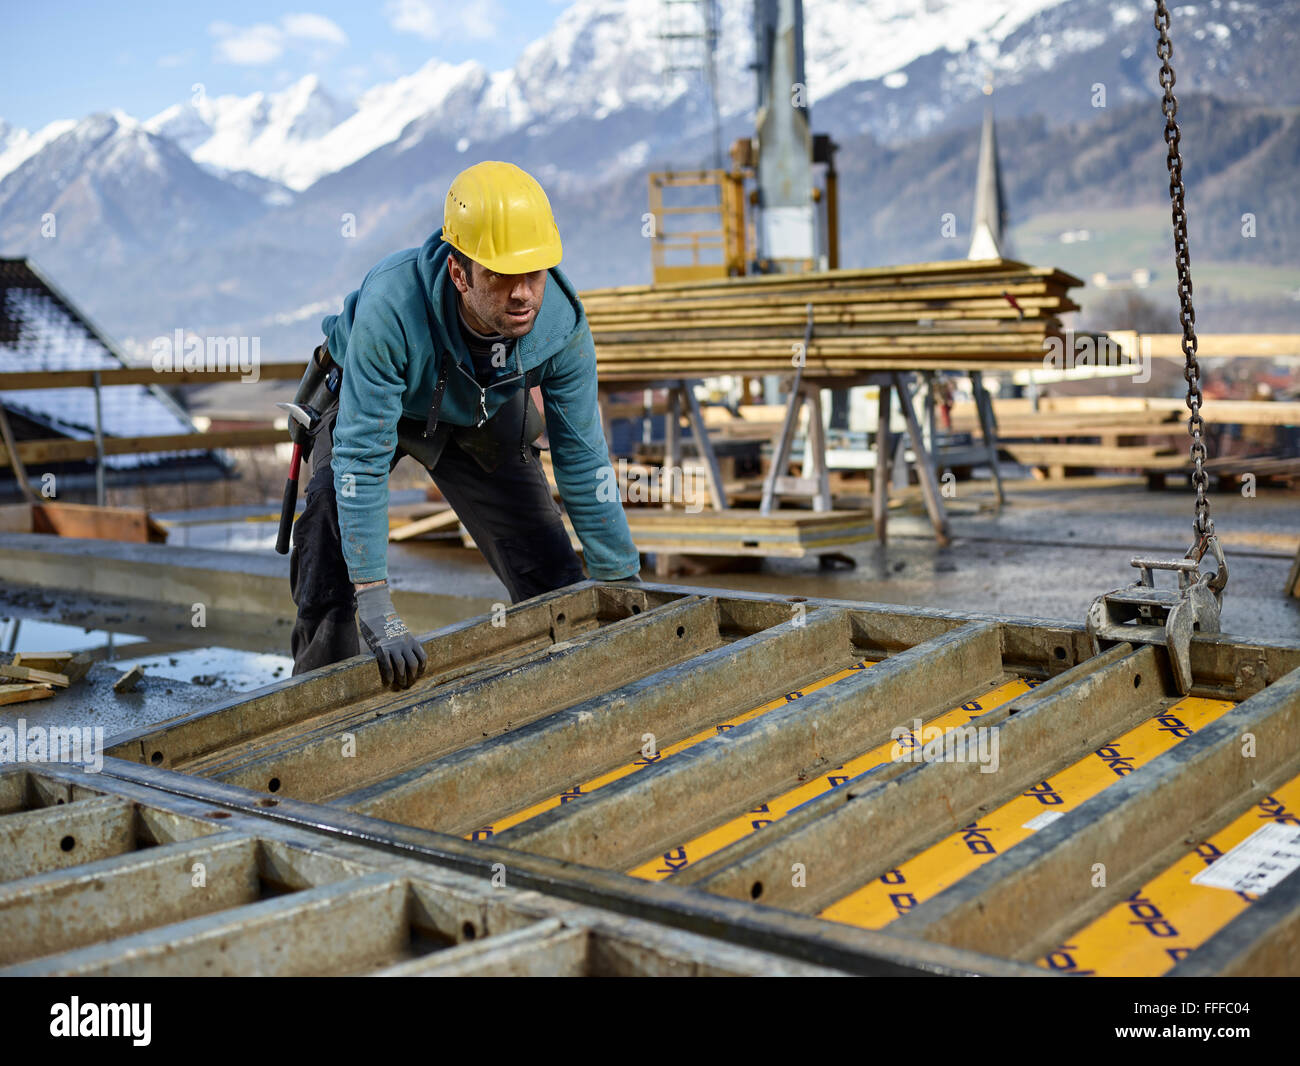 Construction worker lifting shuttering wall with crane, preparing framed formwork, Innsbruck Land, Tyrol, Austria - Stock Image